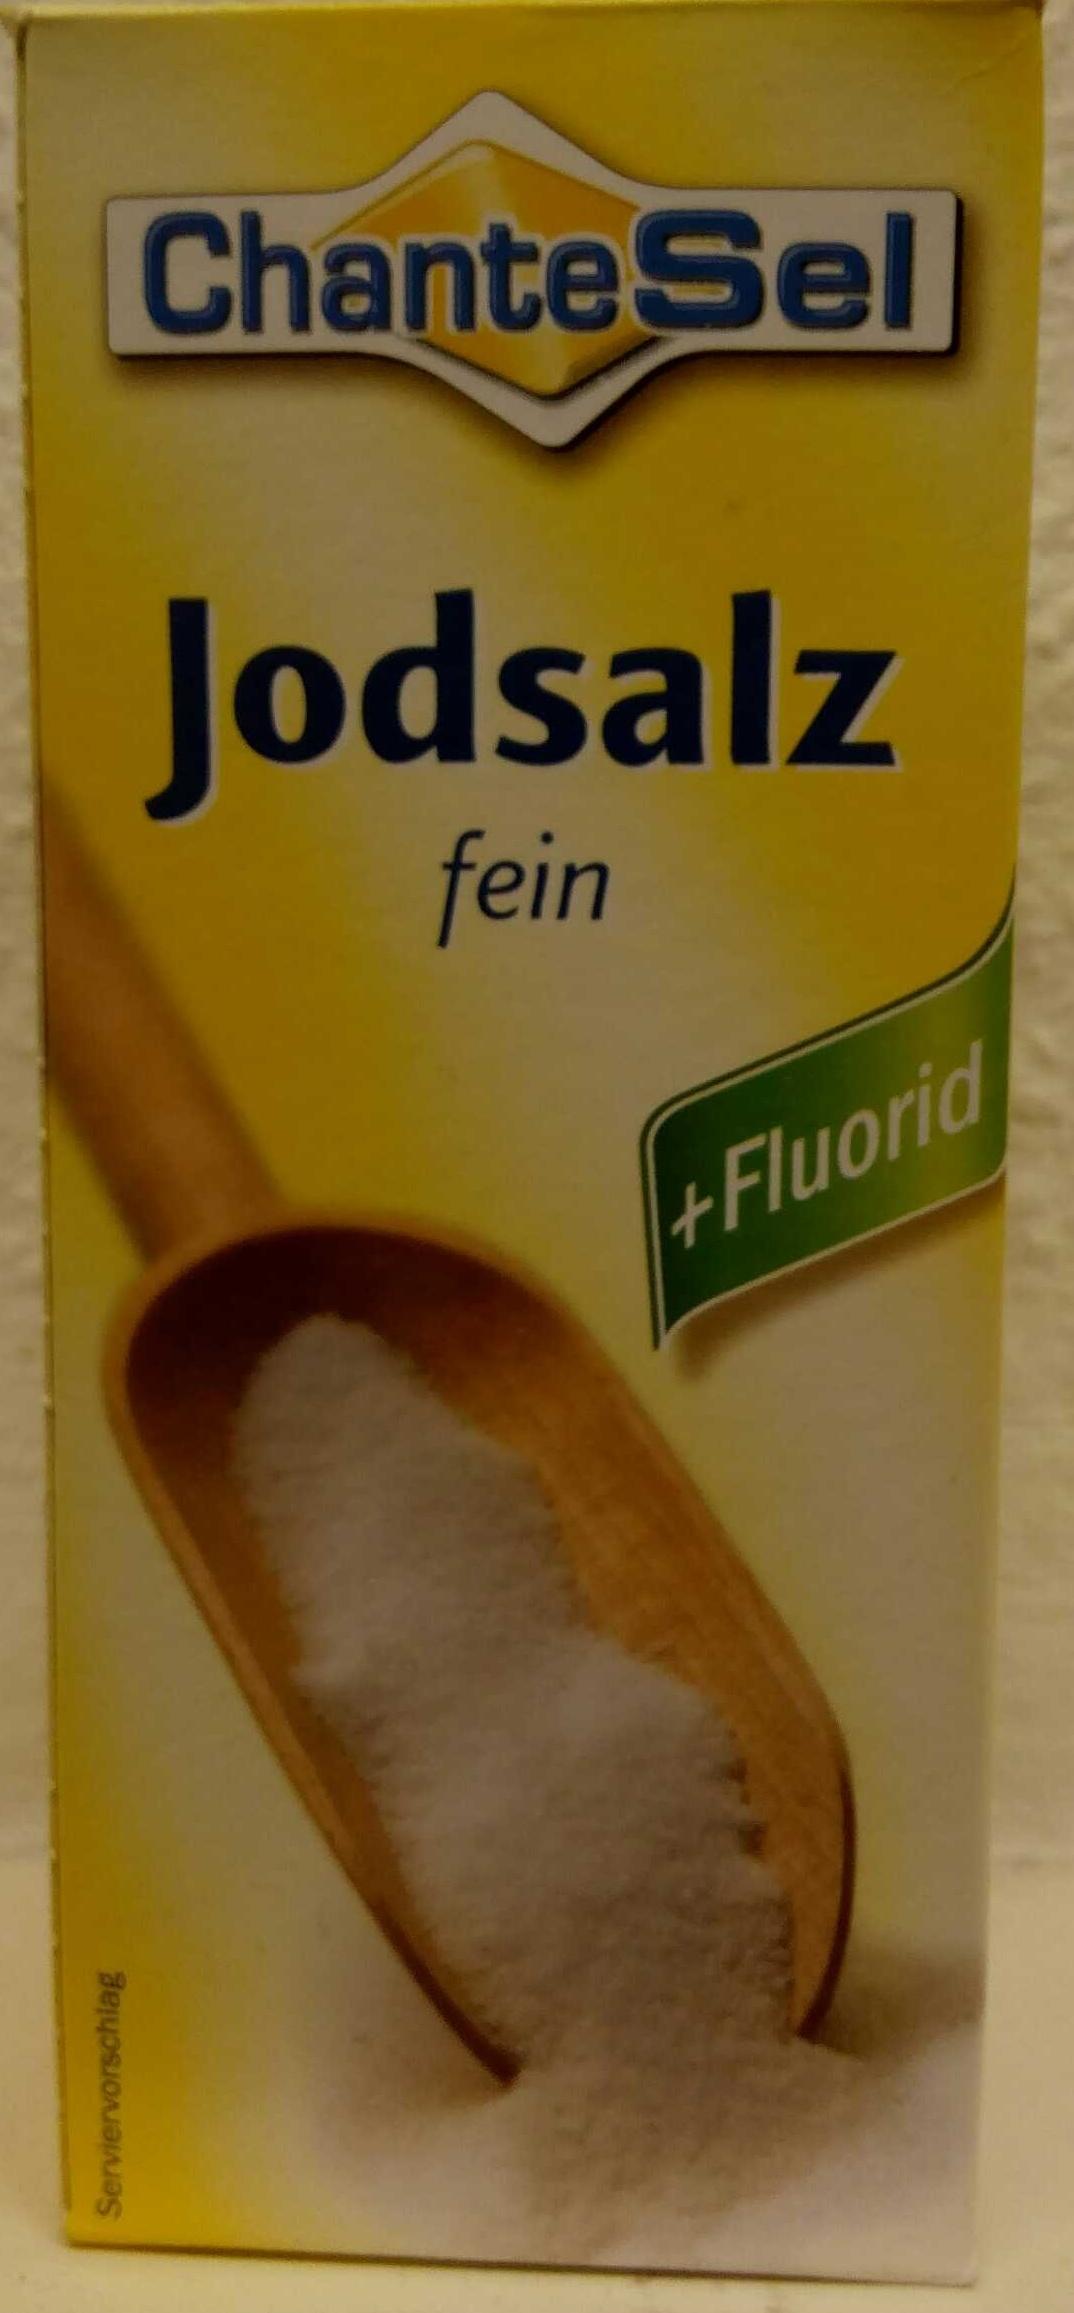 Jodsalz fein - Produkt